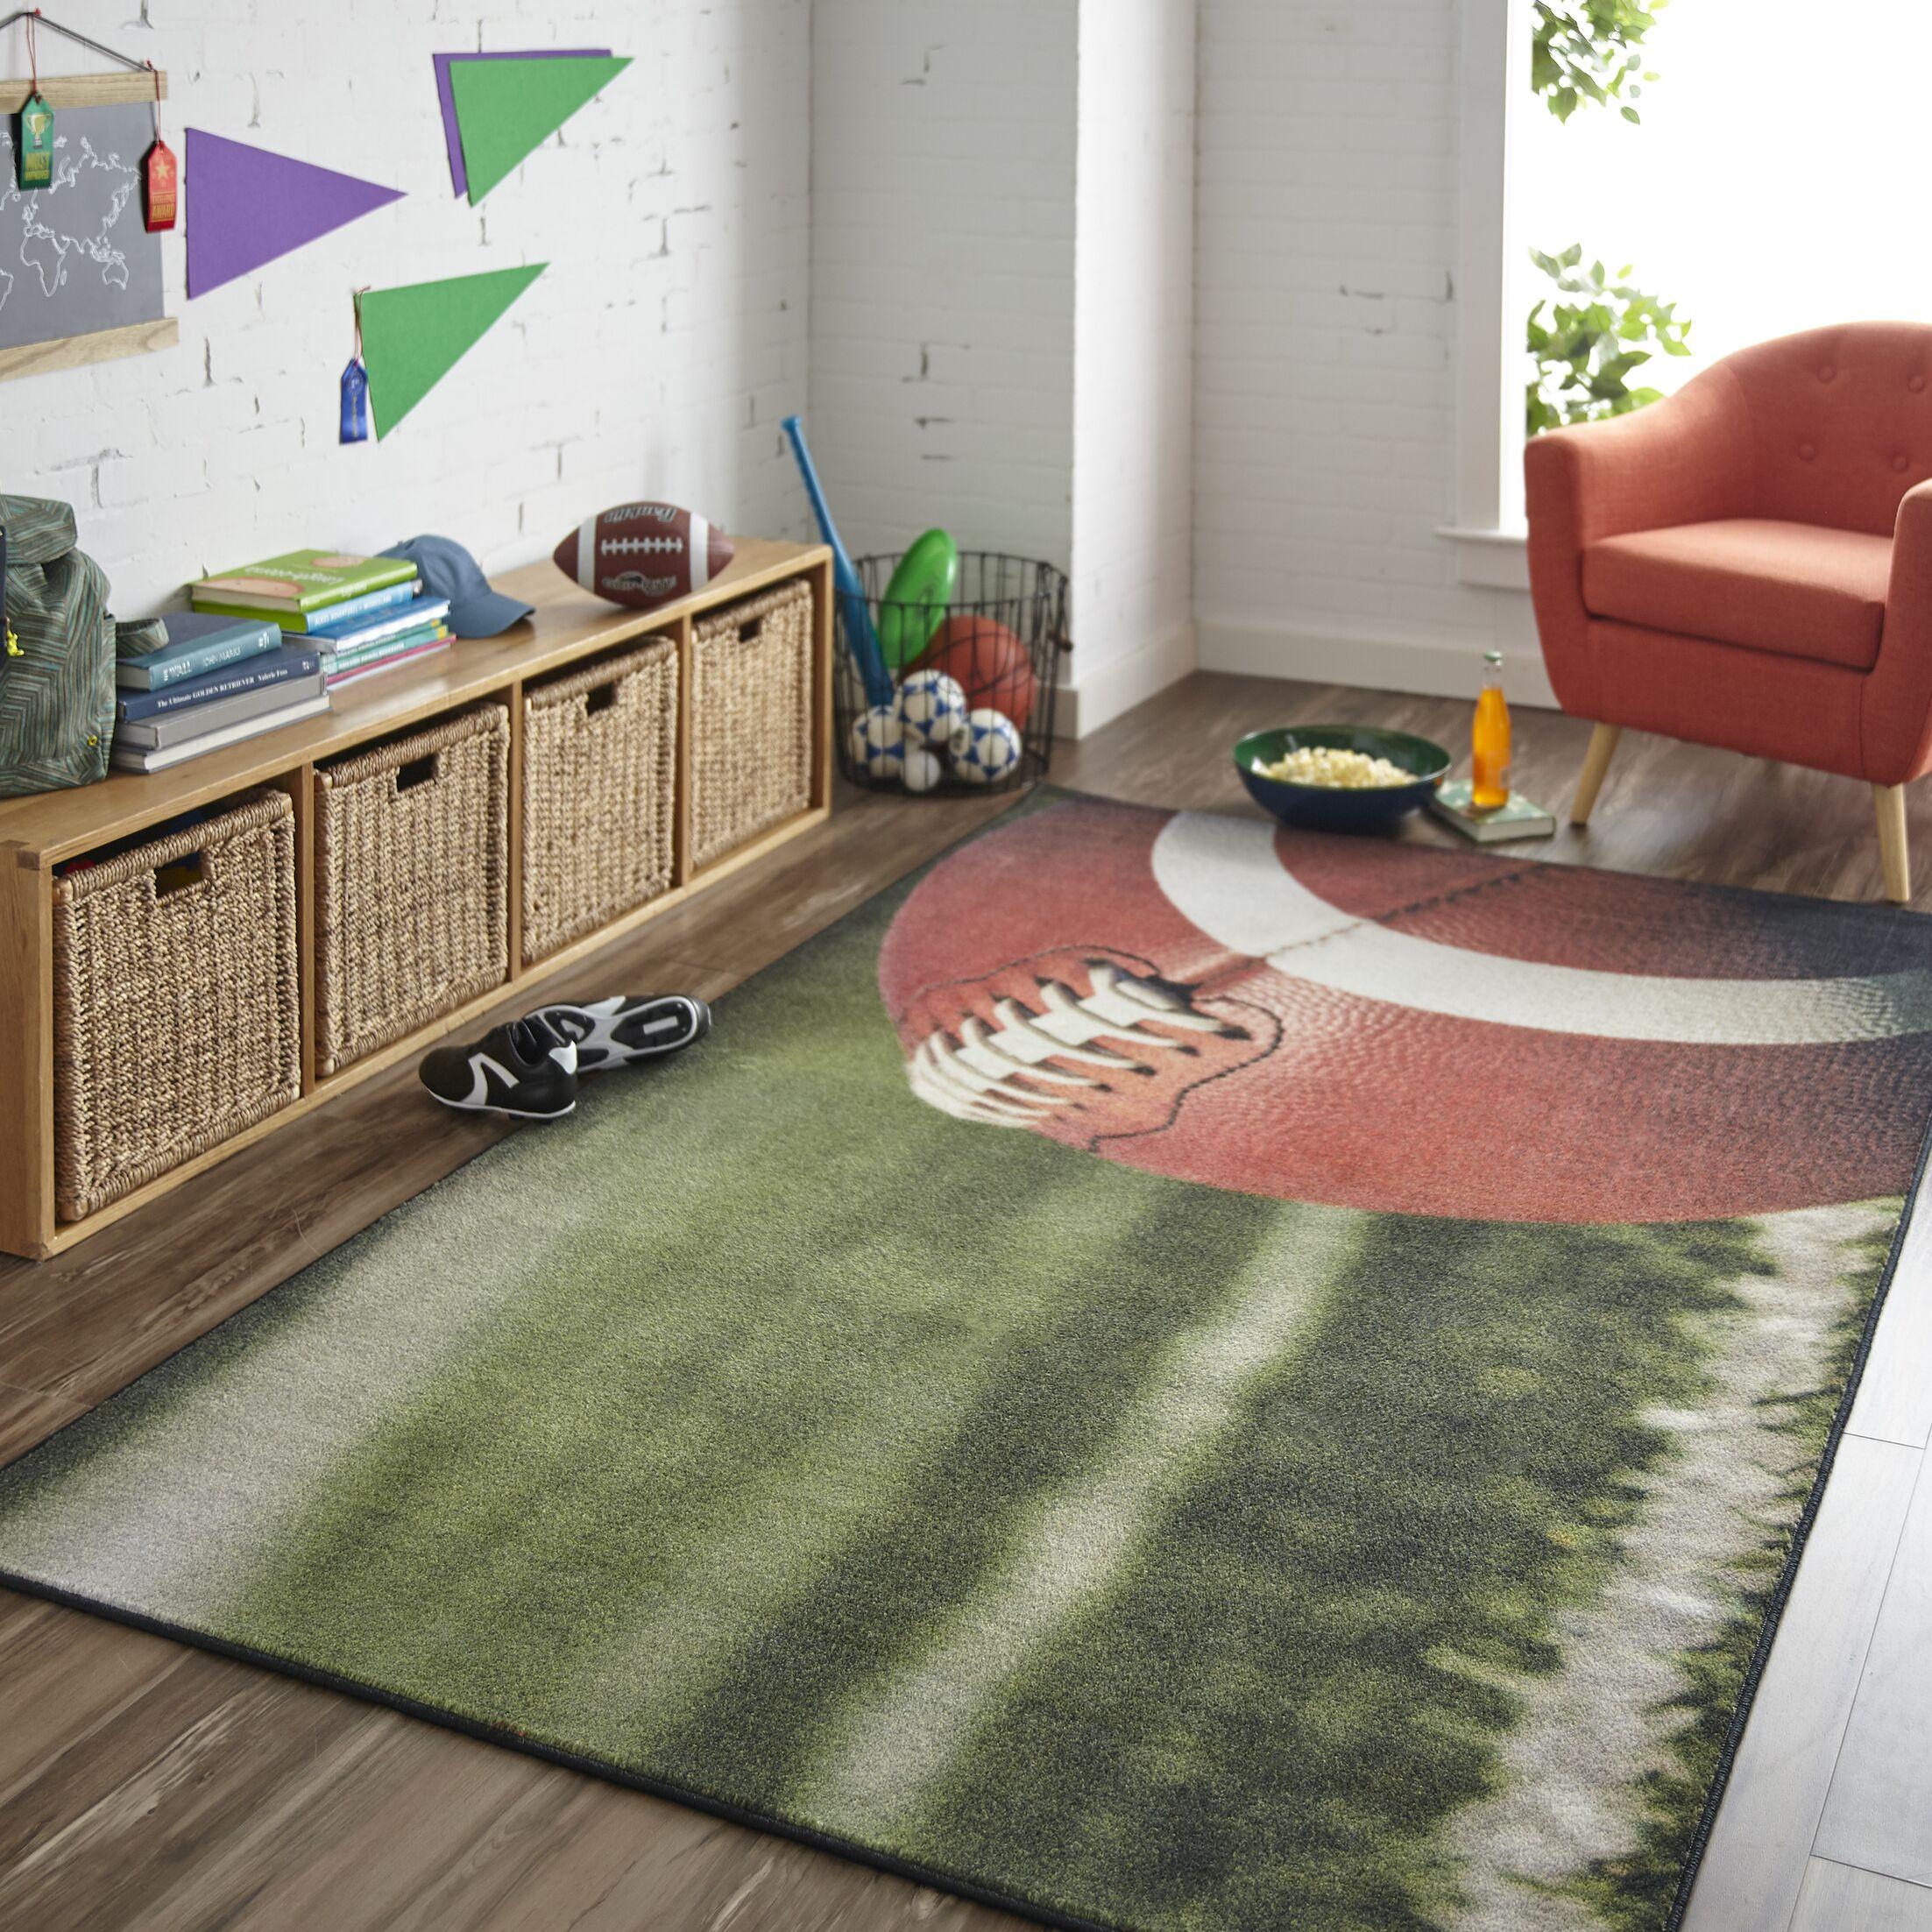 Engler Football Field Green/Brown Area Rug Rug Size: Rectangle 5' x 8'